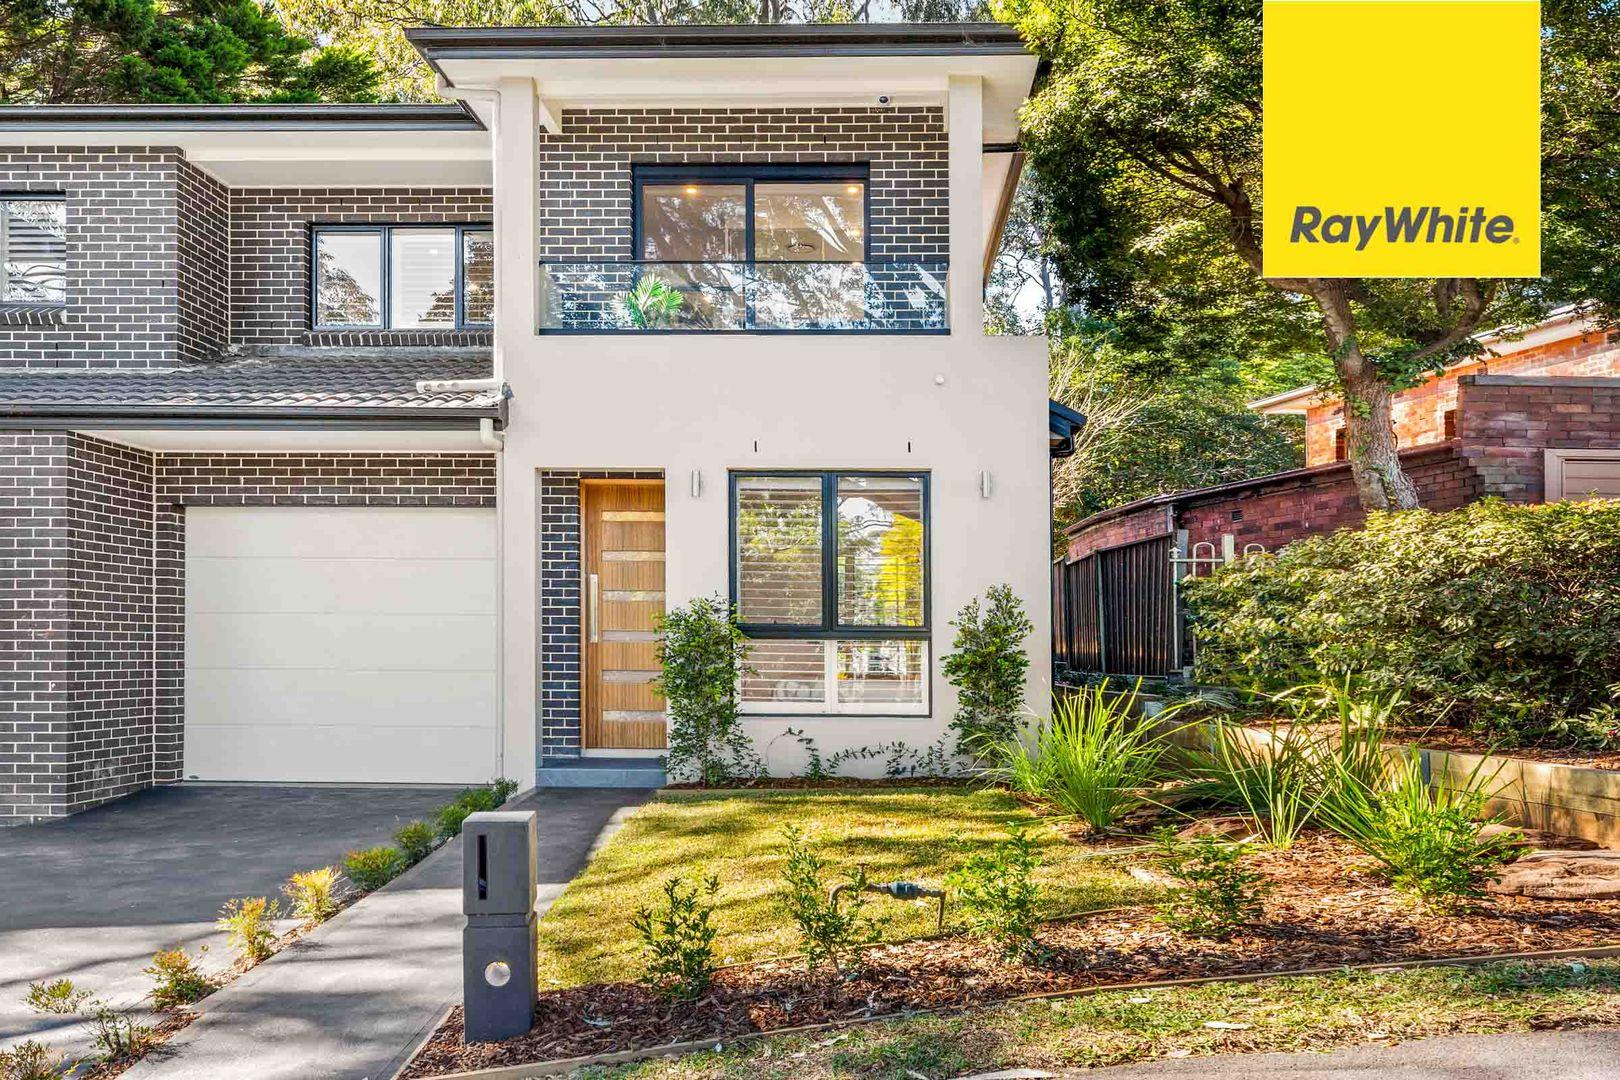 151 Ryedale Road, Denistone NSW 2114, Image 0